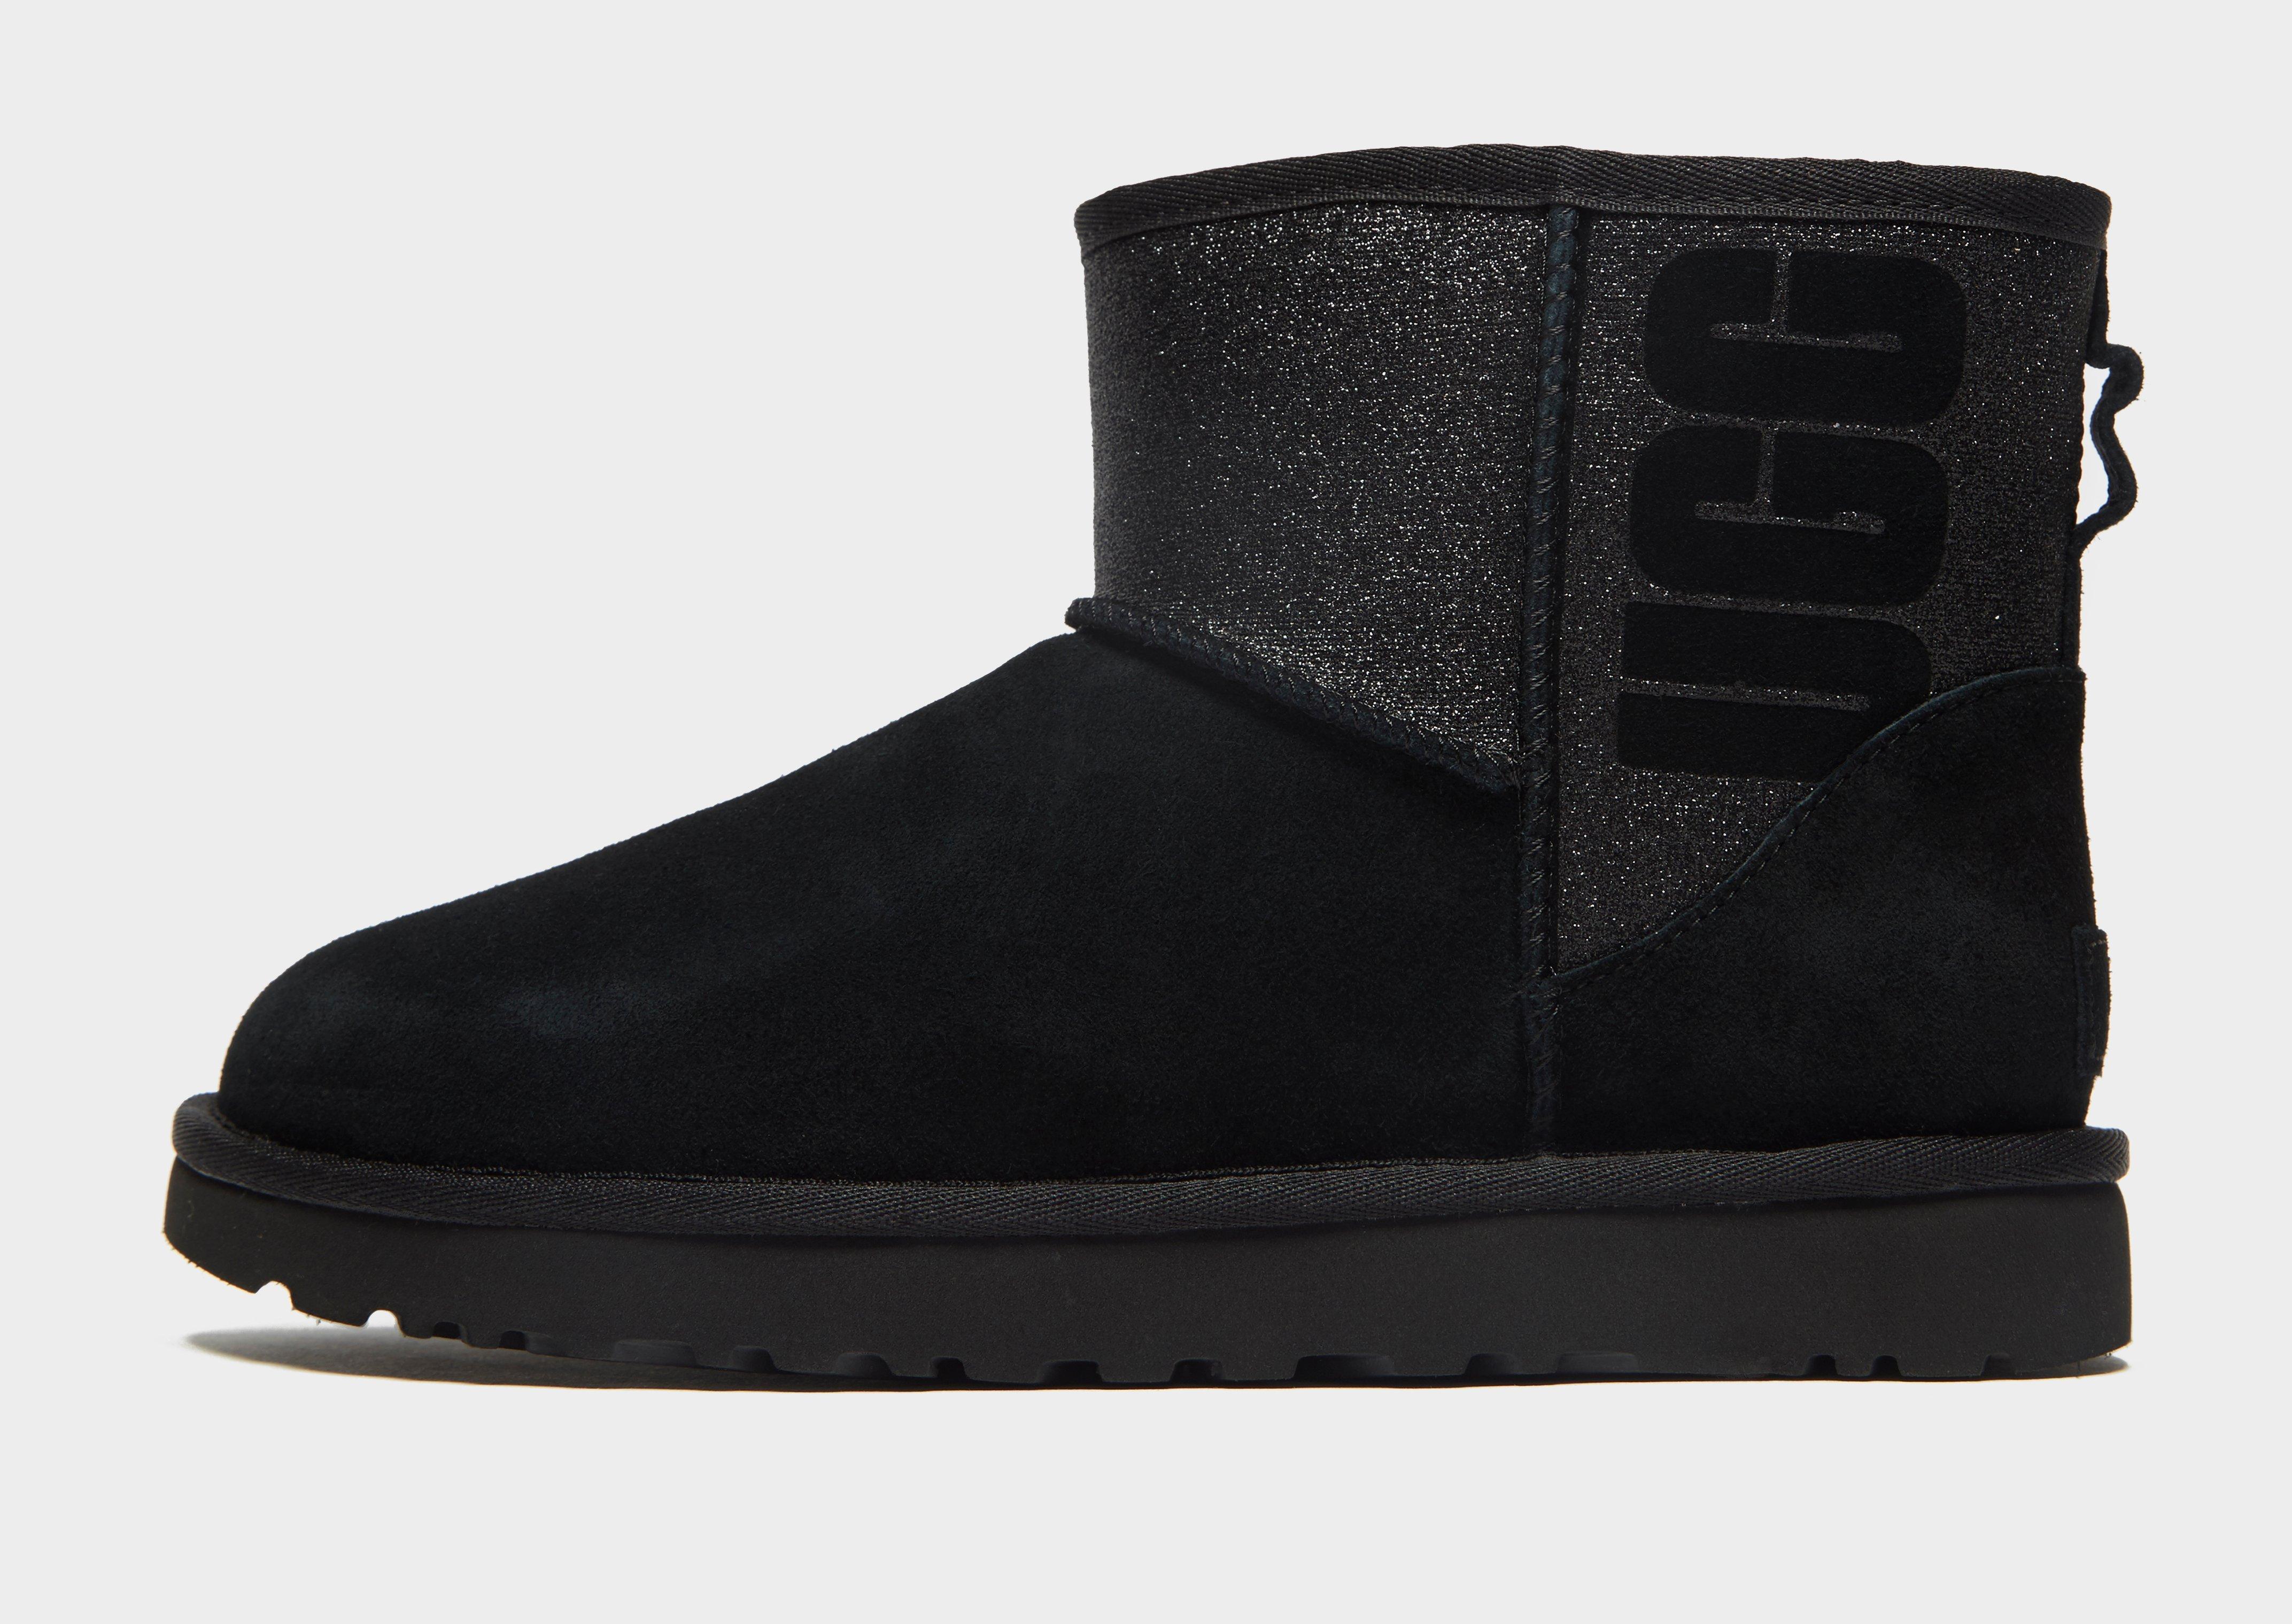 ab2ef669442 Ugg - Black Mini Sparkle Boots - Lyst